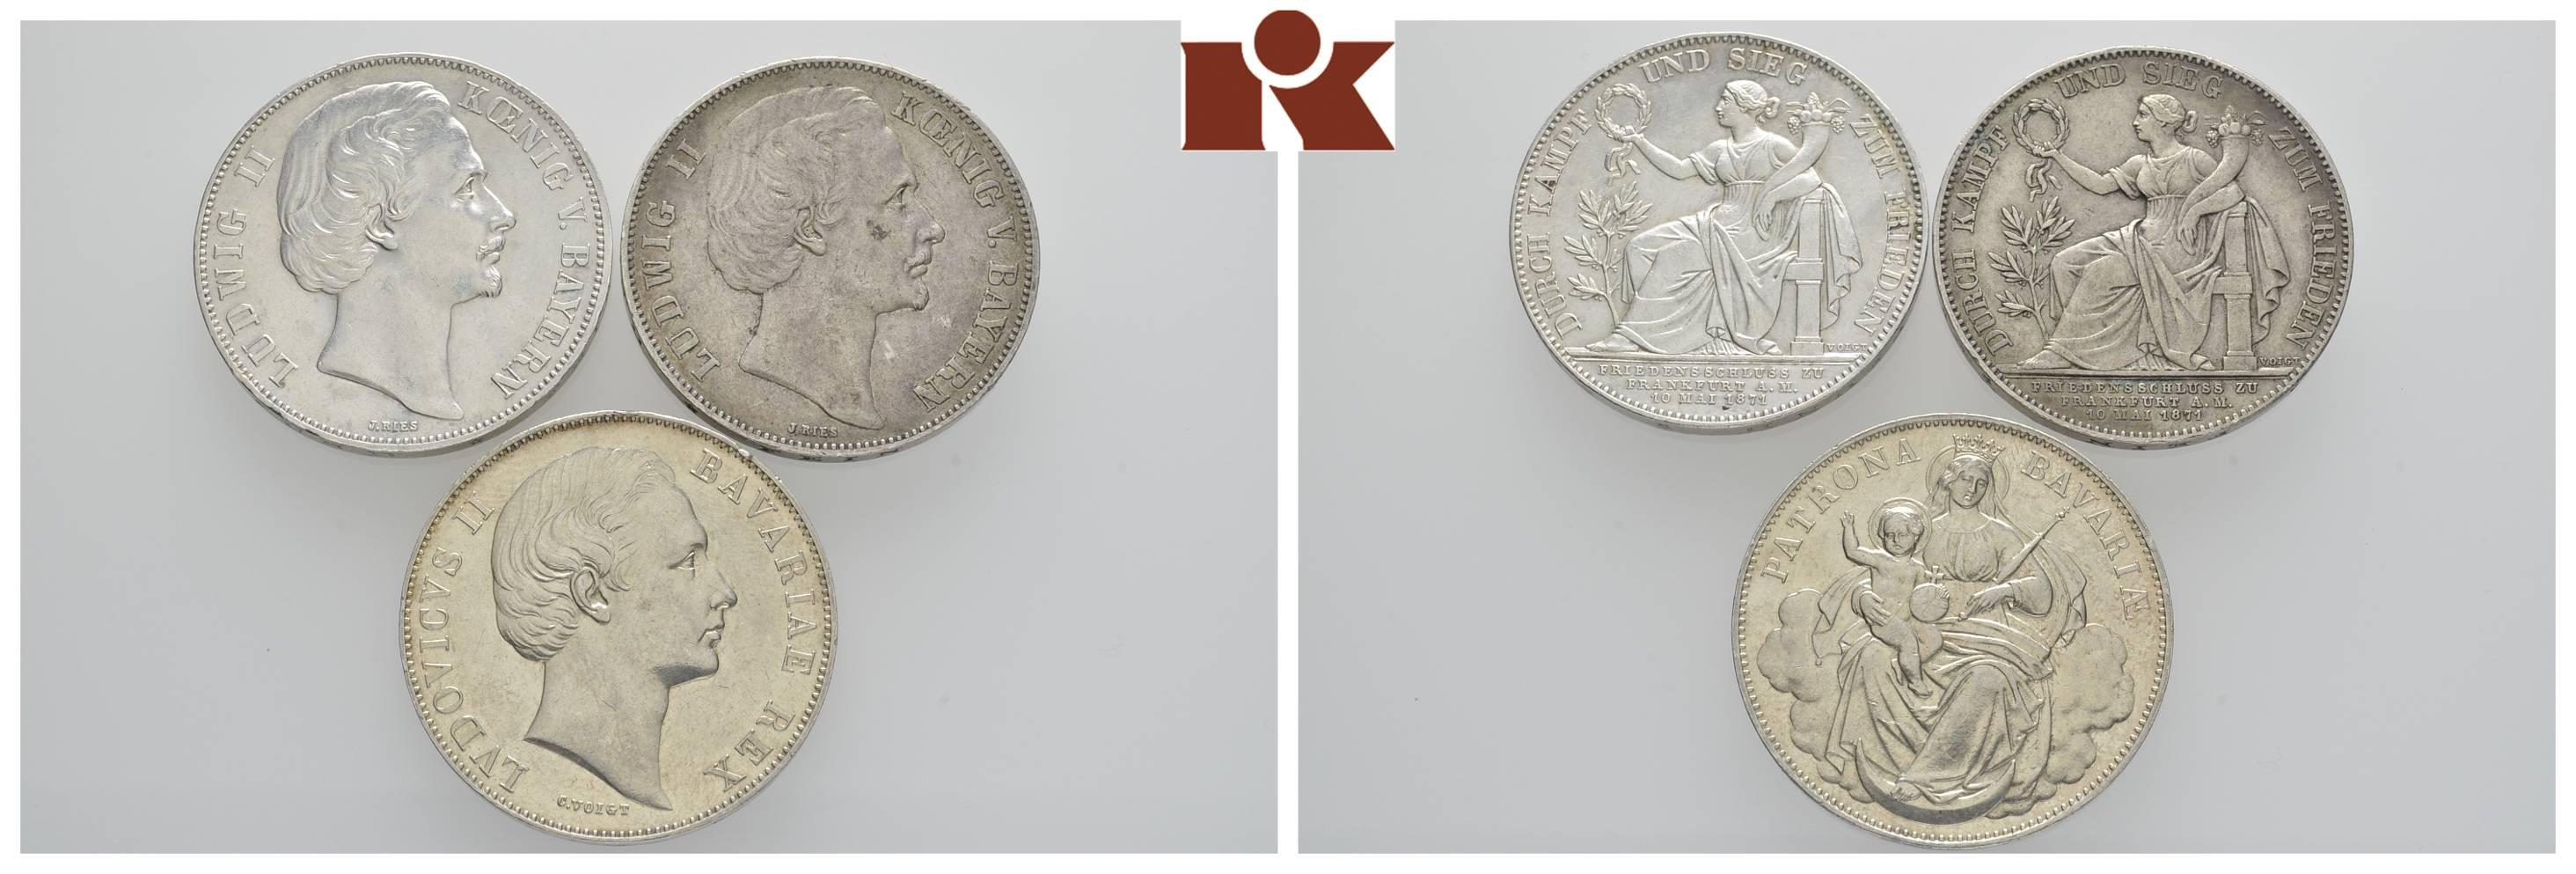 Ludwig Ii 1864 1886 Vereinstaler Thun 104 2x Siegestaler 1871